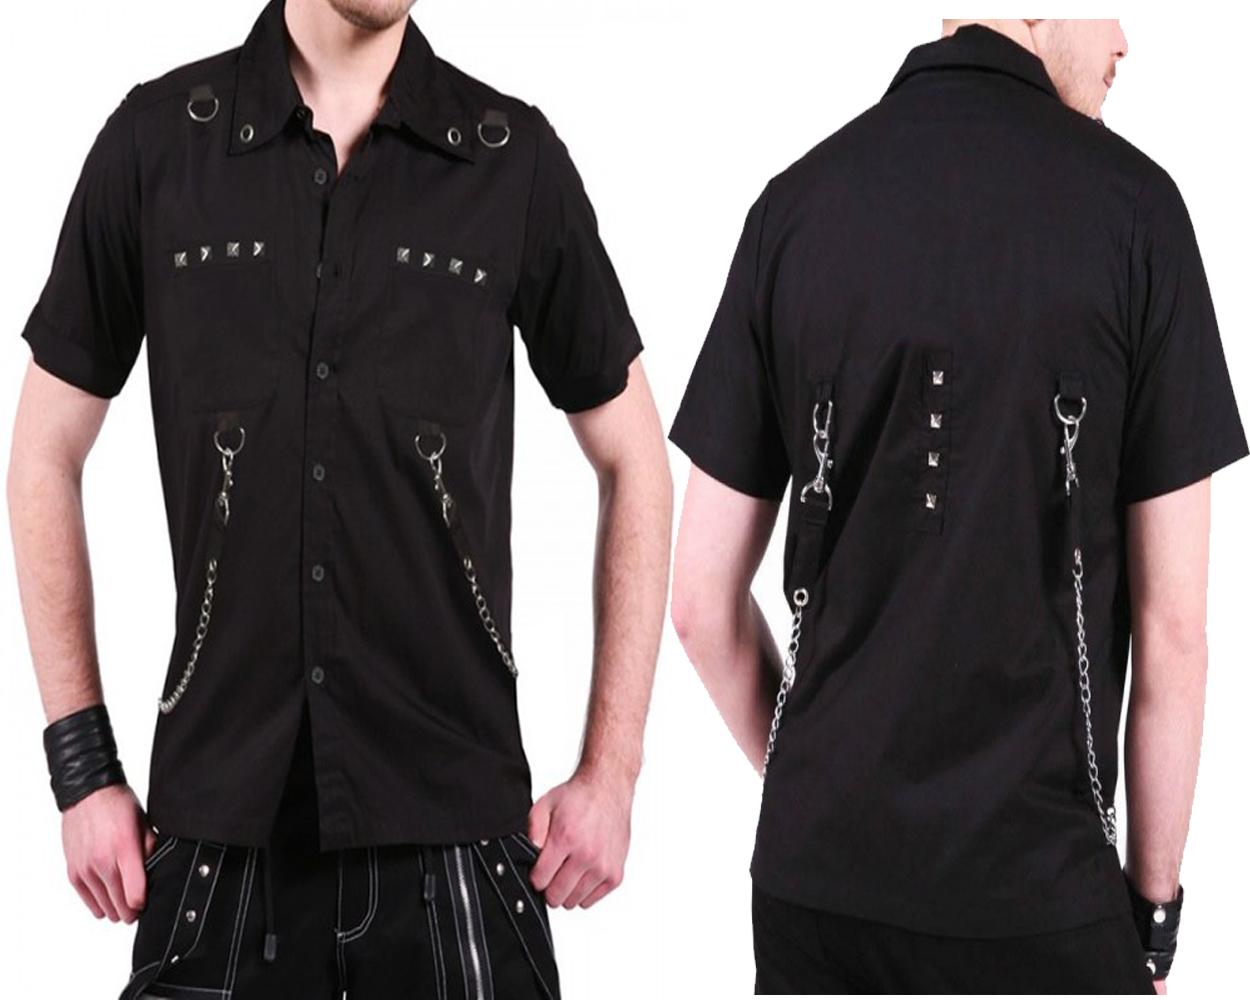 Men New Gothic Shirt Punk Rock Black Cotton Shirt With Rebelsmarket